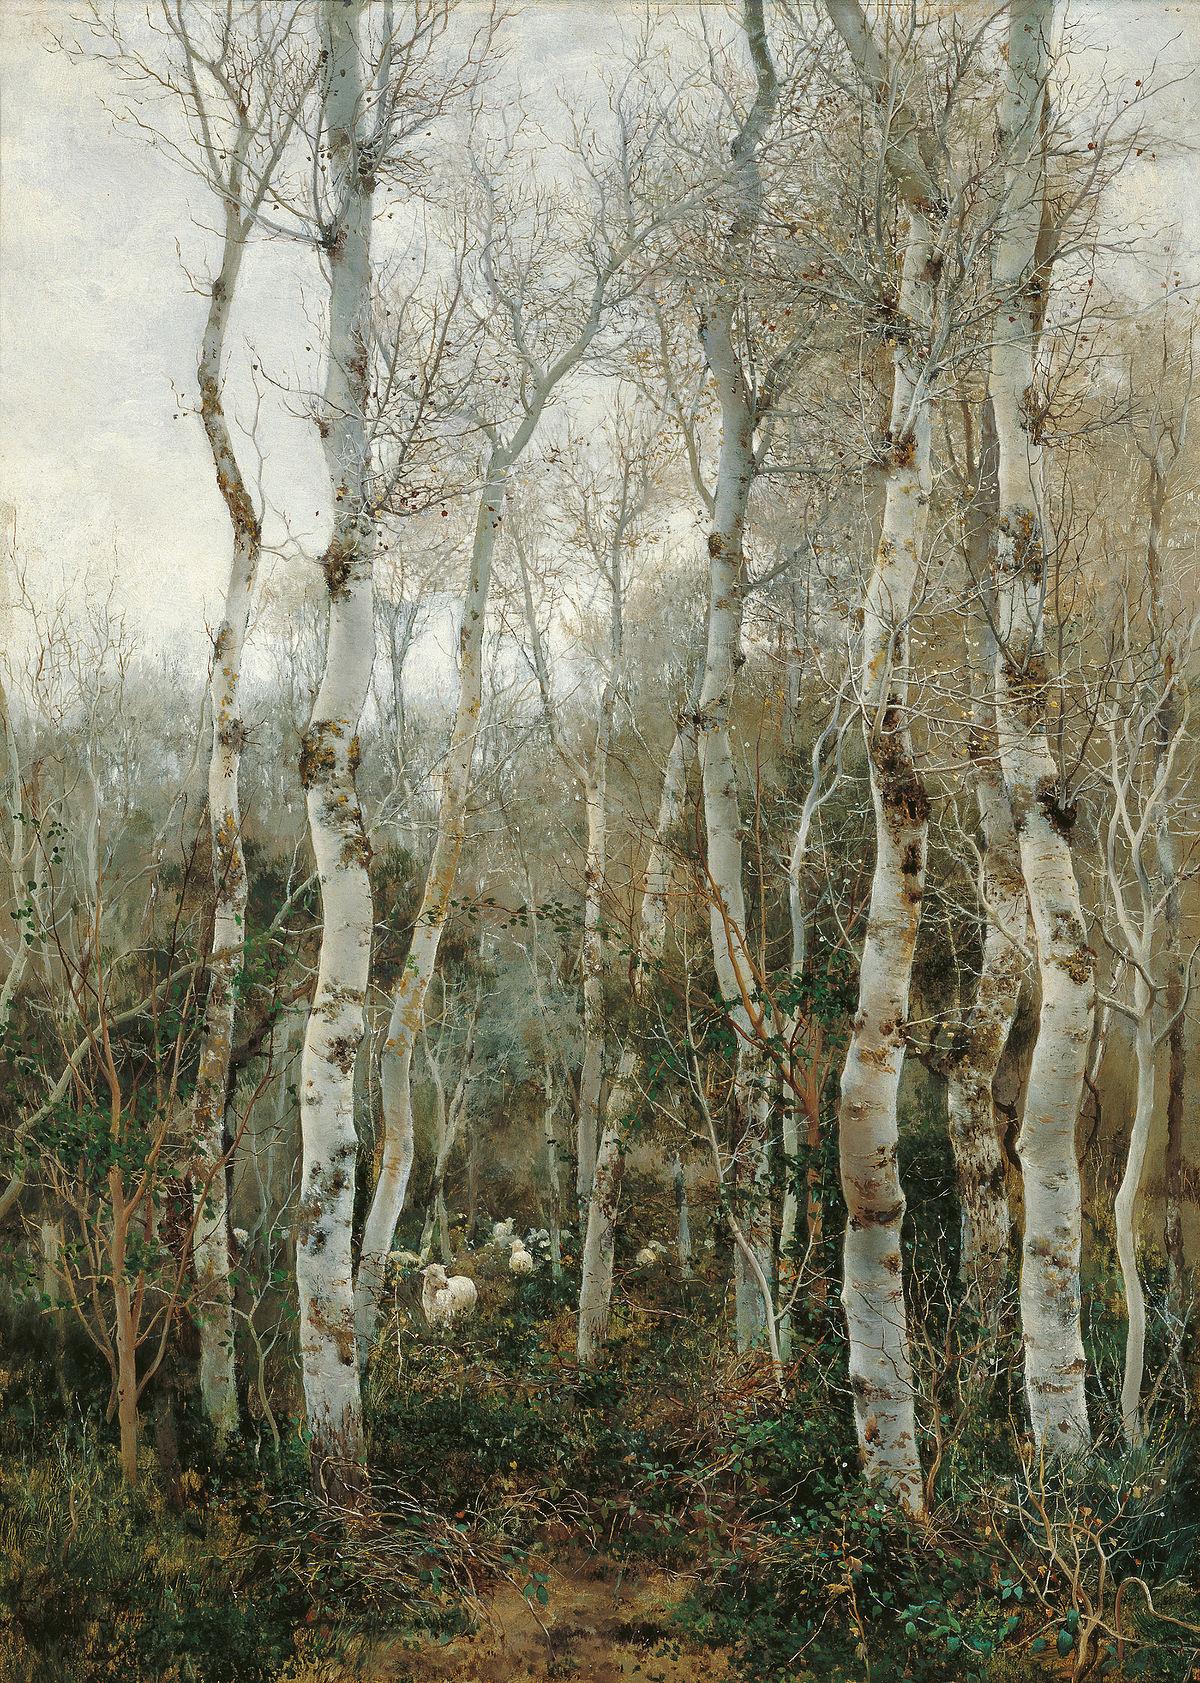 Emilio Prieto Paintings For Sale